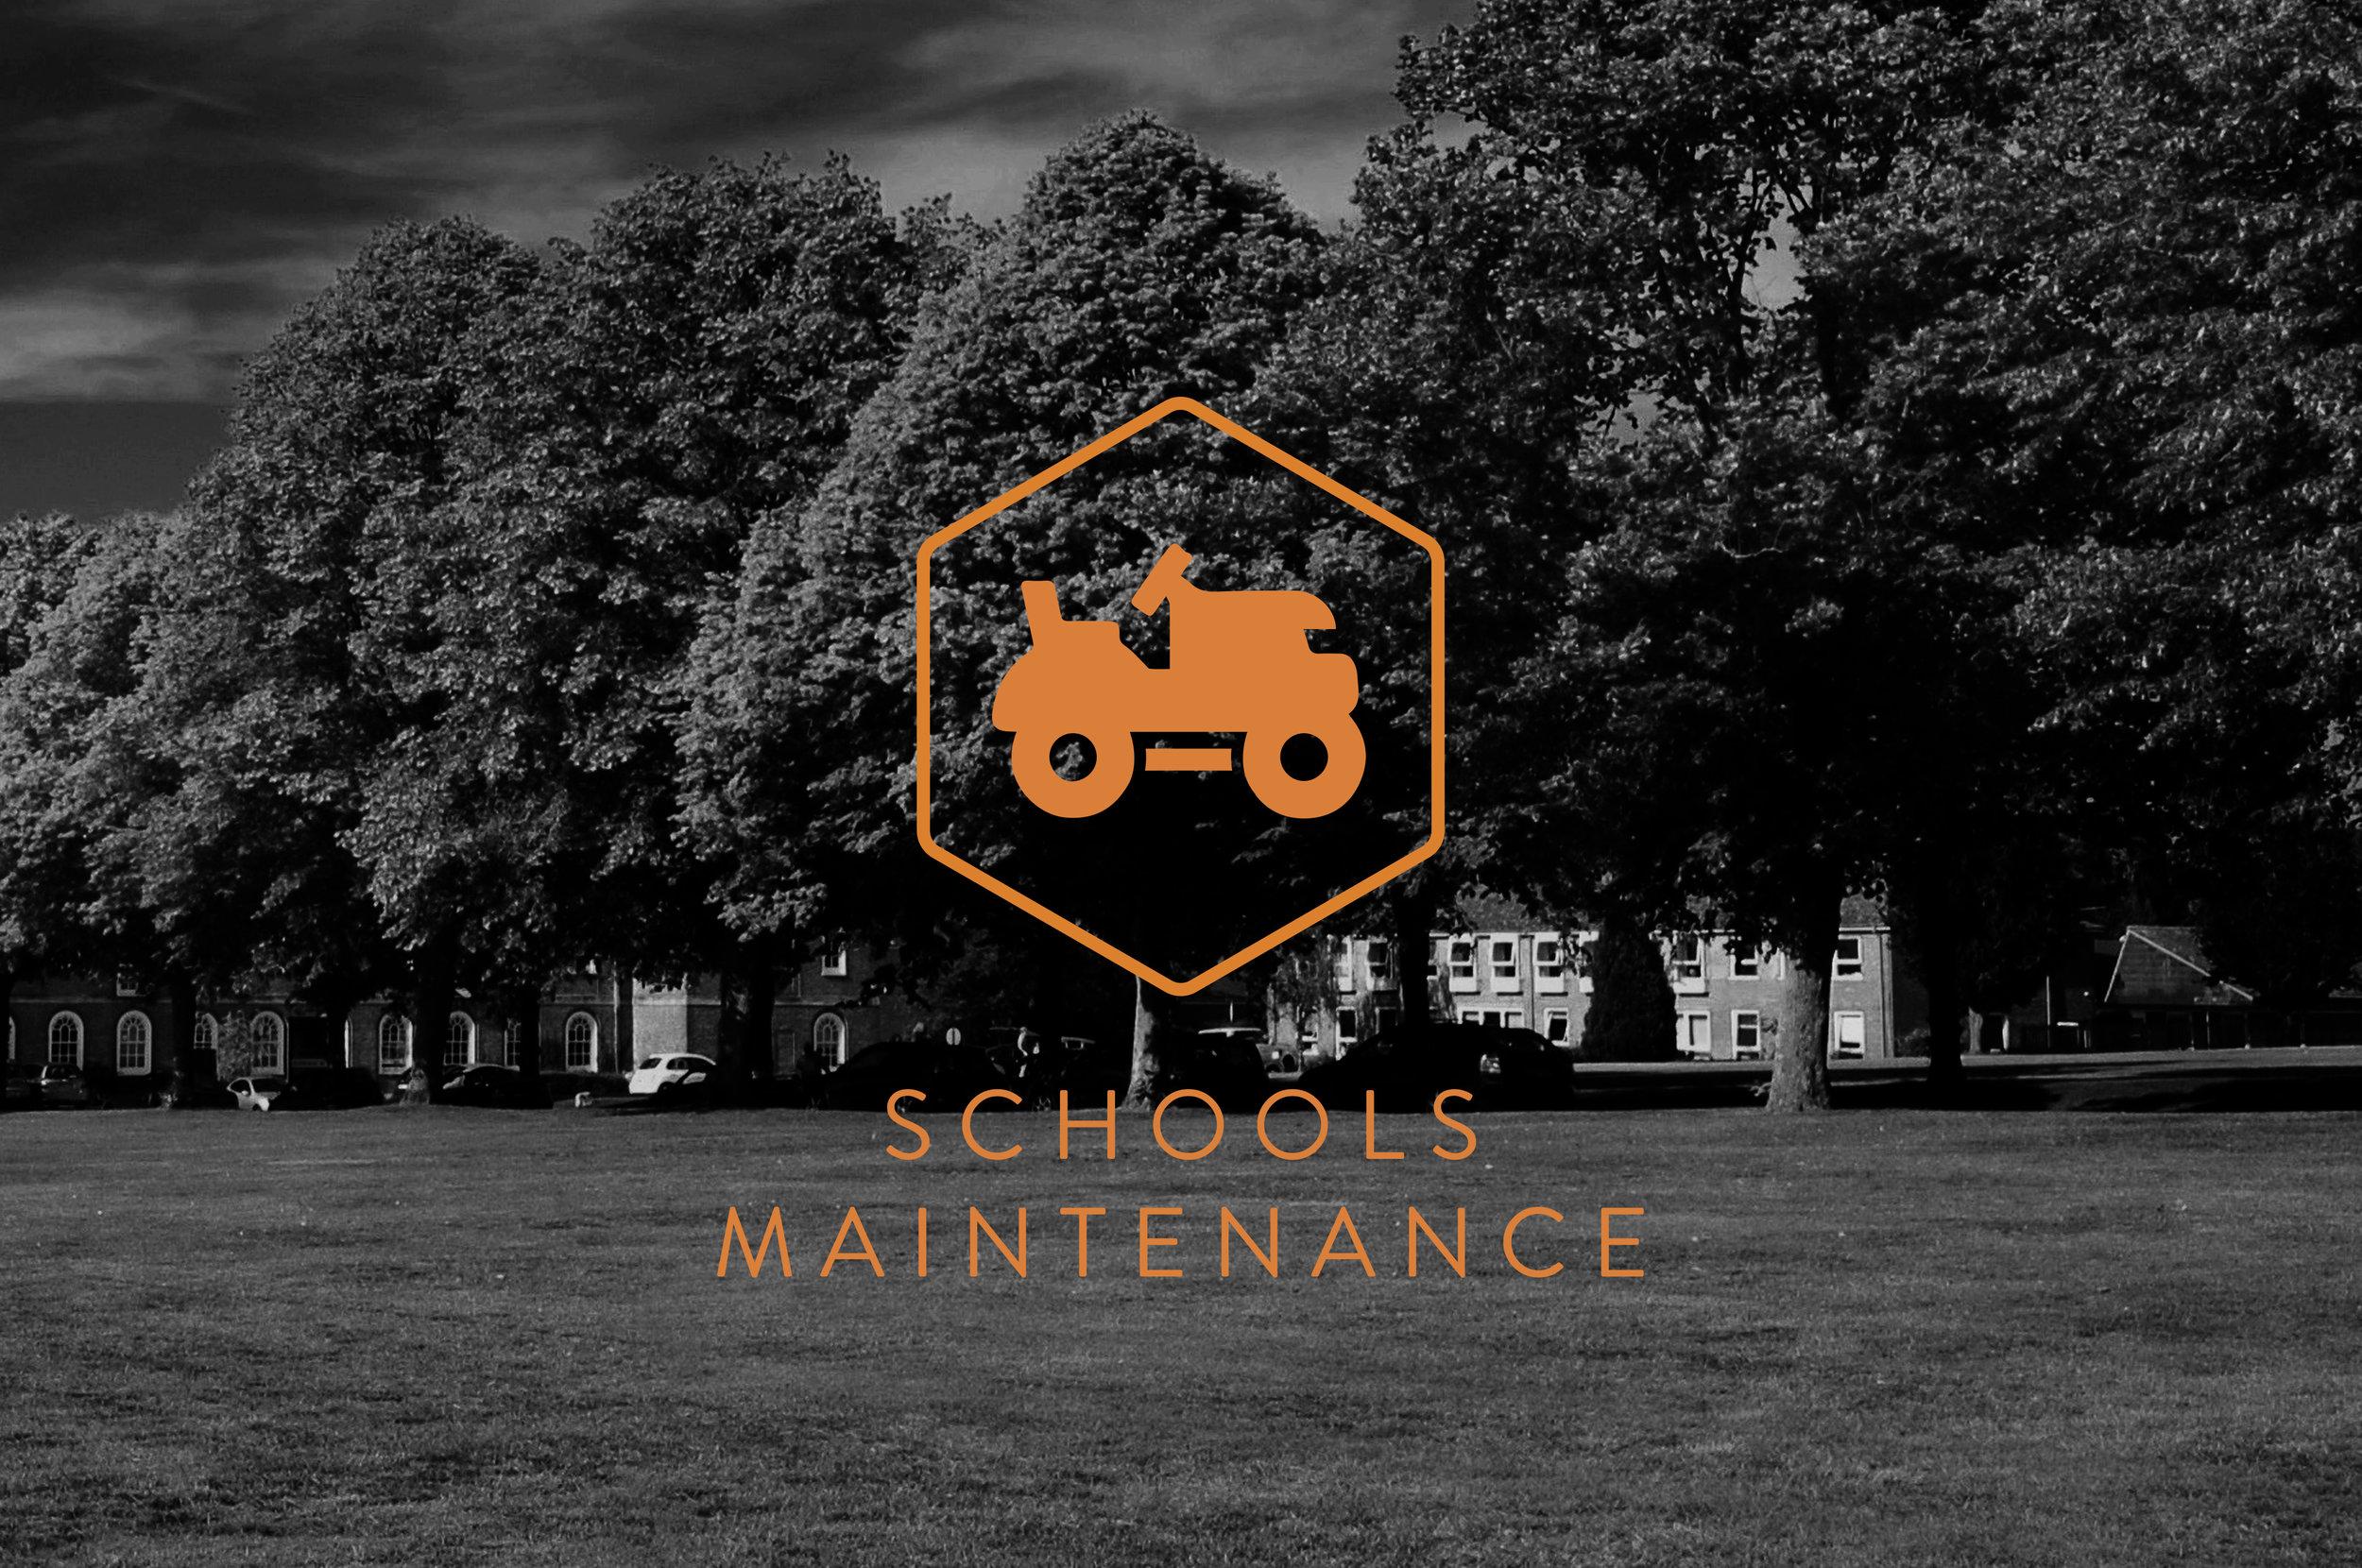 Schools-maintenance-02.jpg